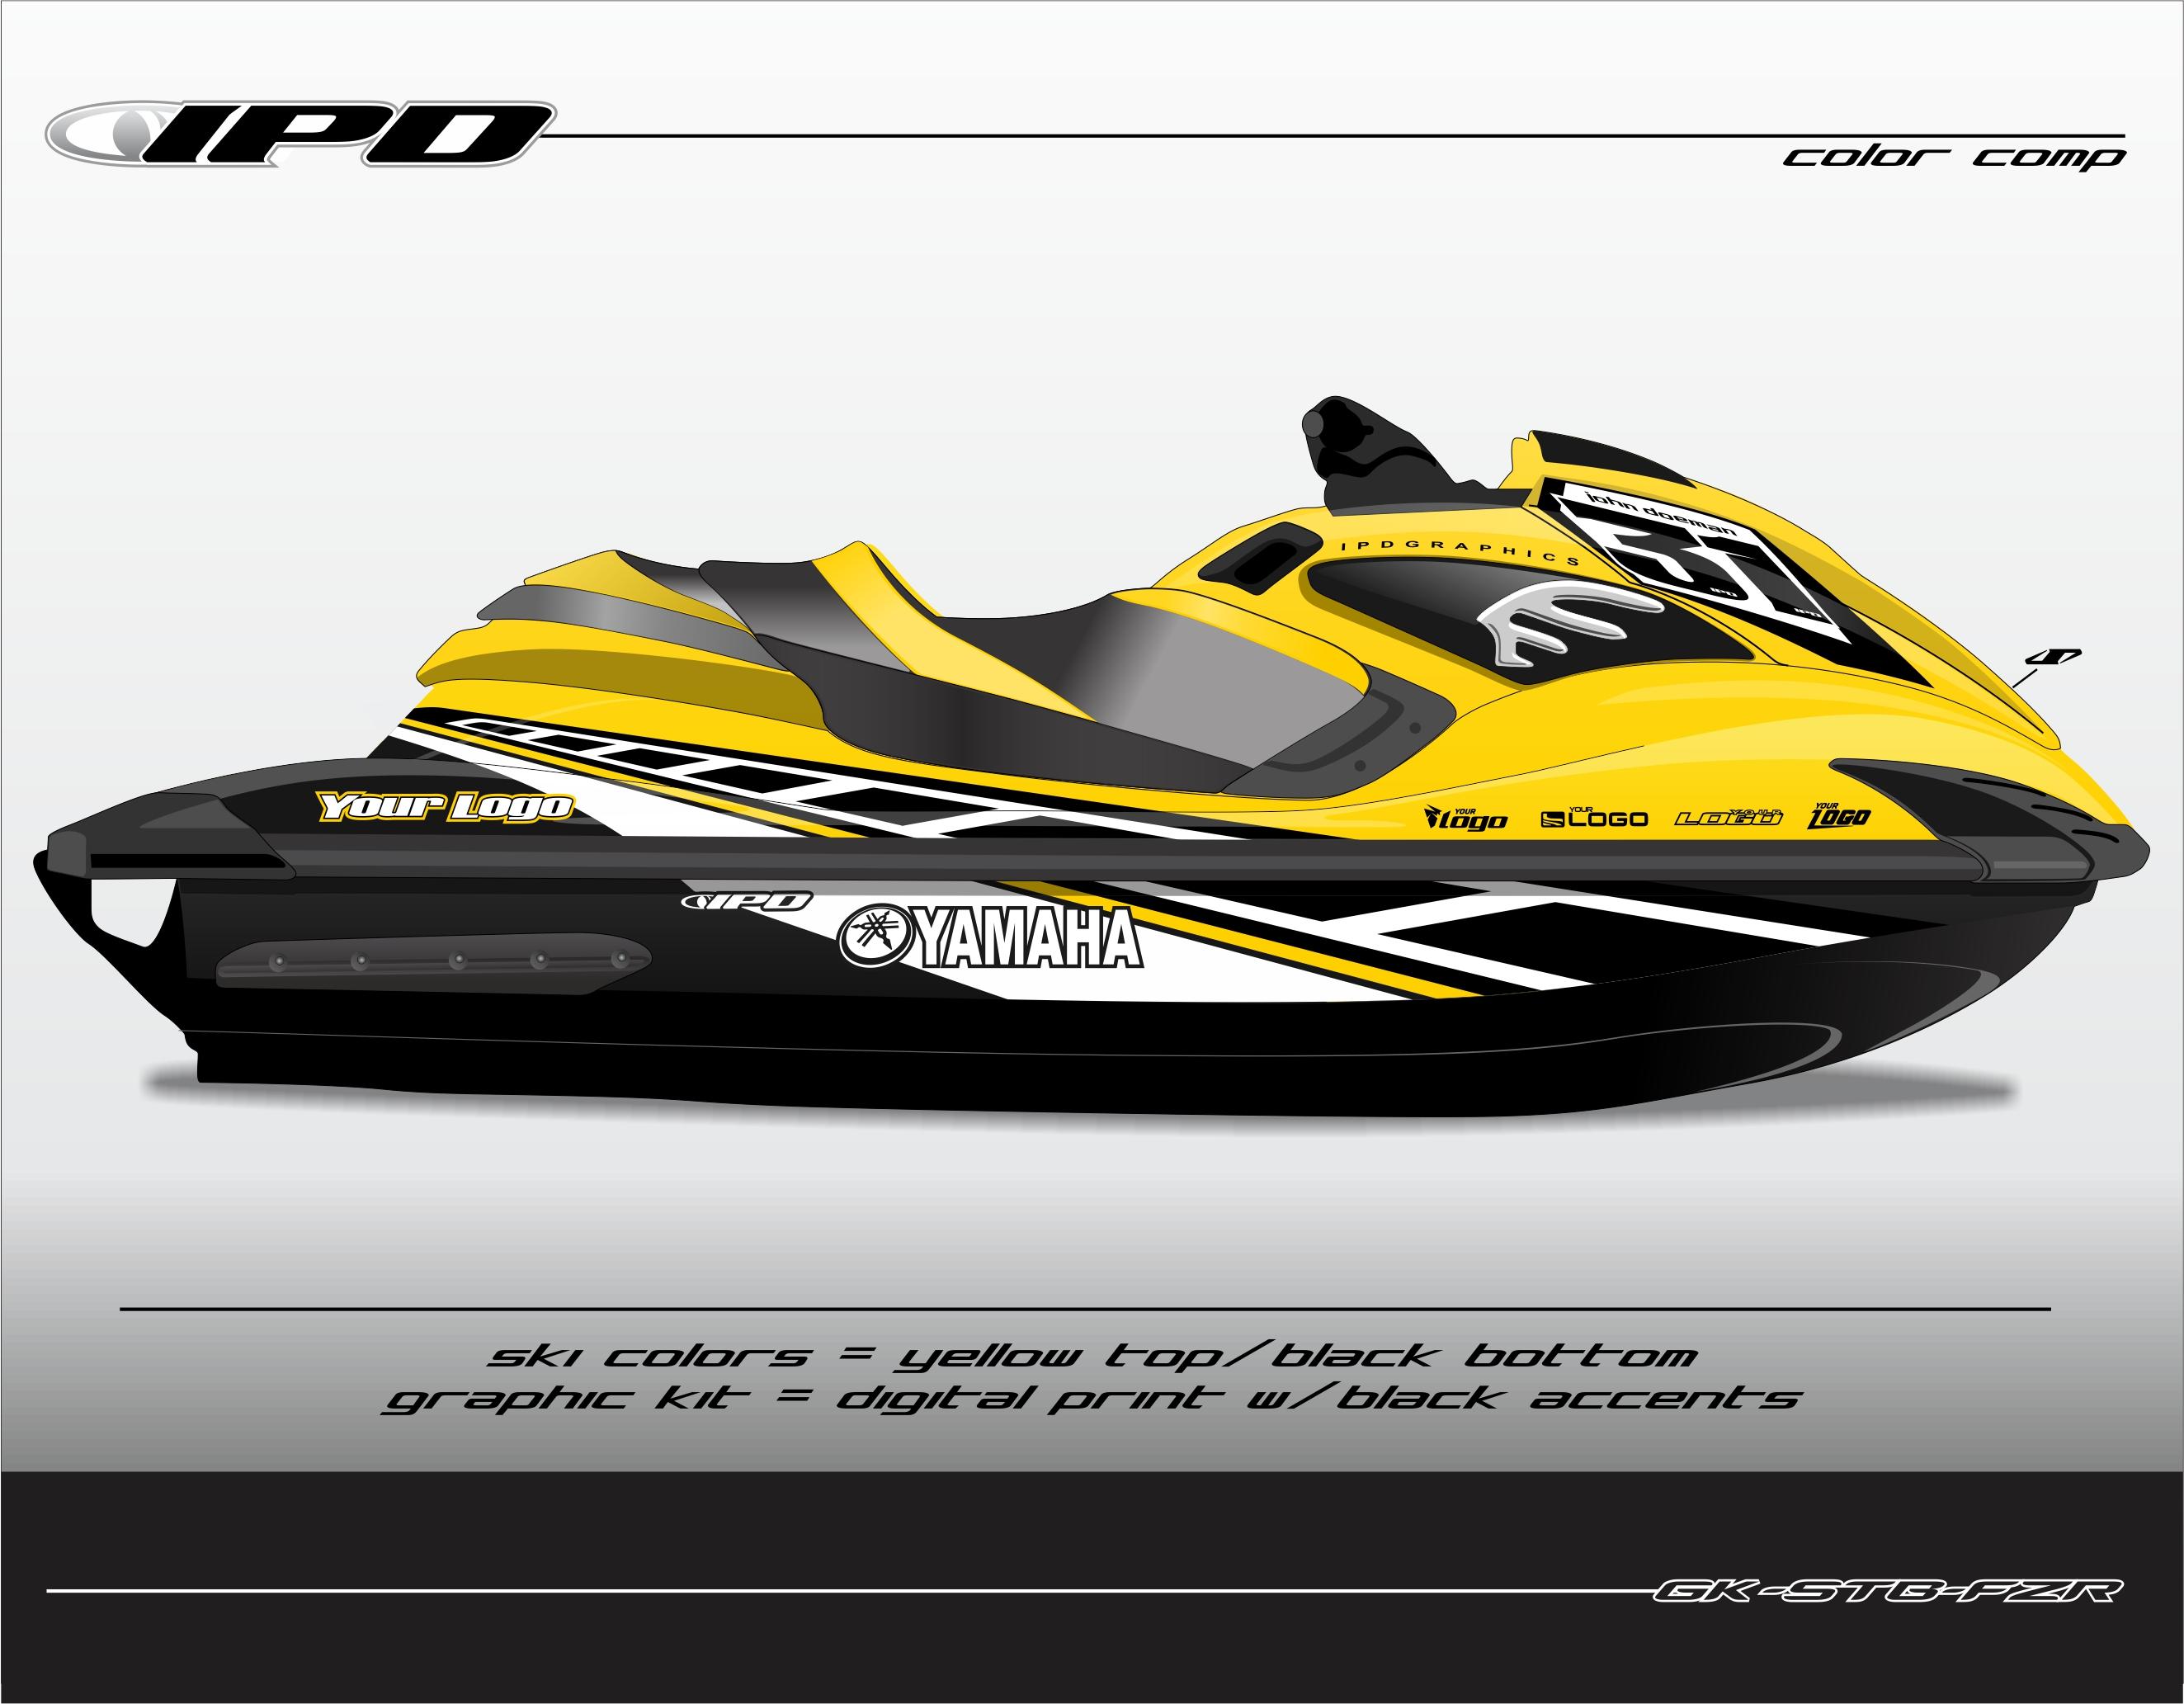 yamaha fzr fzs graphics kits ipd jet ski graphics. Black Bedroom Furniture Sets. Home Design Ideas